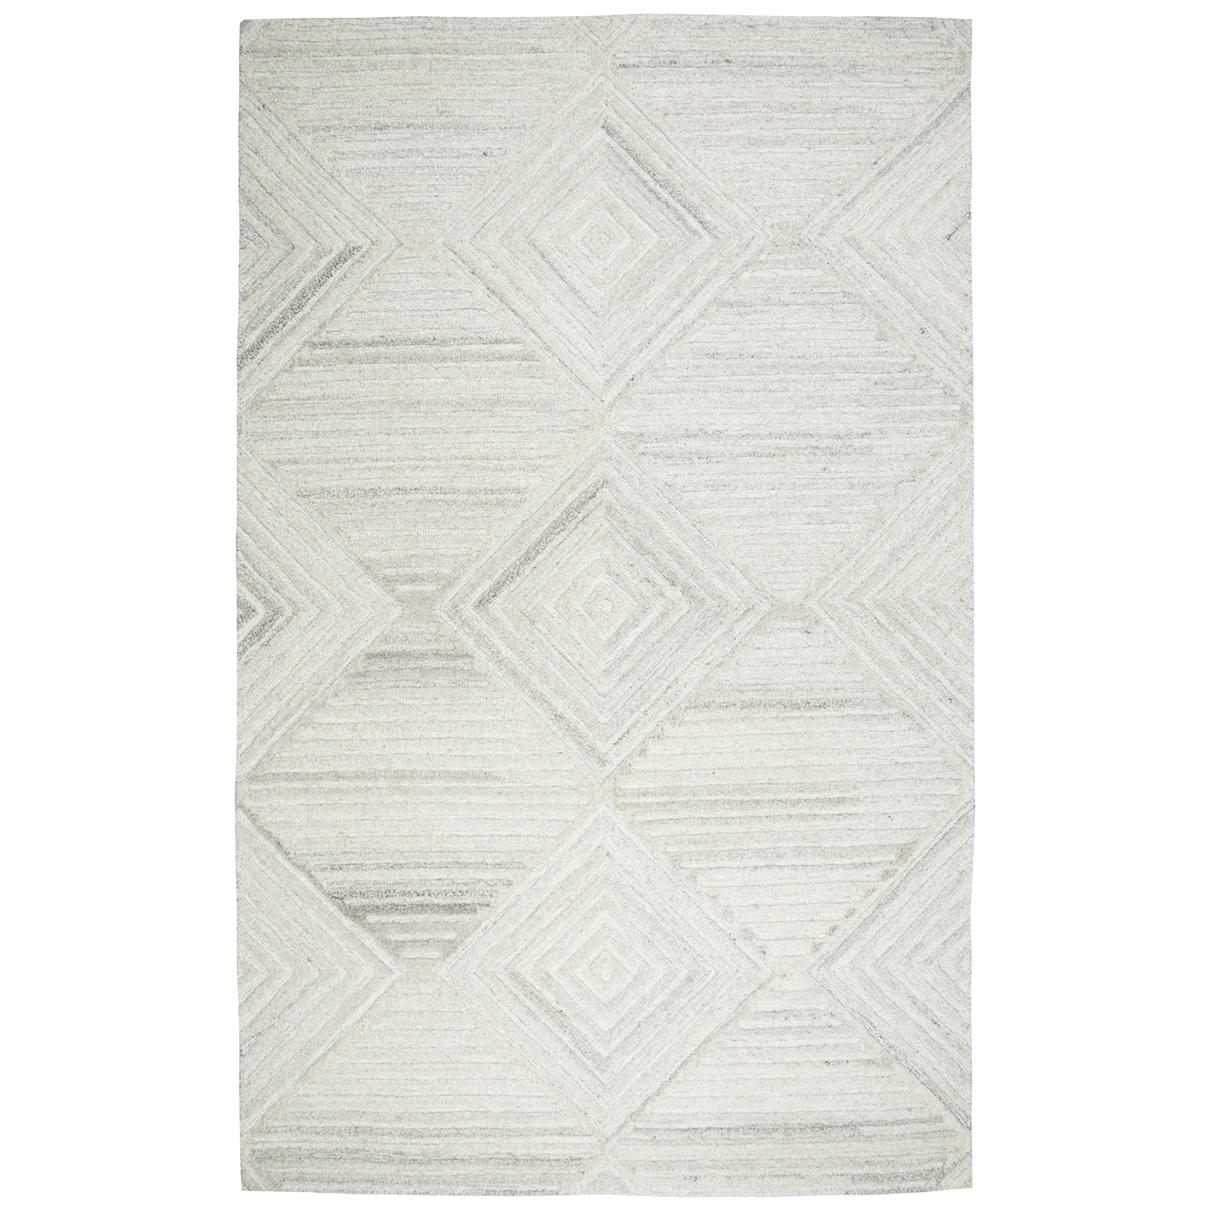 Hand-tufted Makalu Ivory  Geometric/ Solid  Wool Area Rug  (9 x 12) - 9 x 12 (9 x 12 - Ivory)